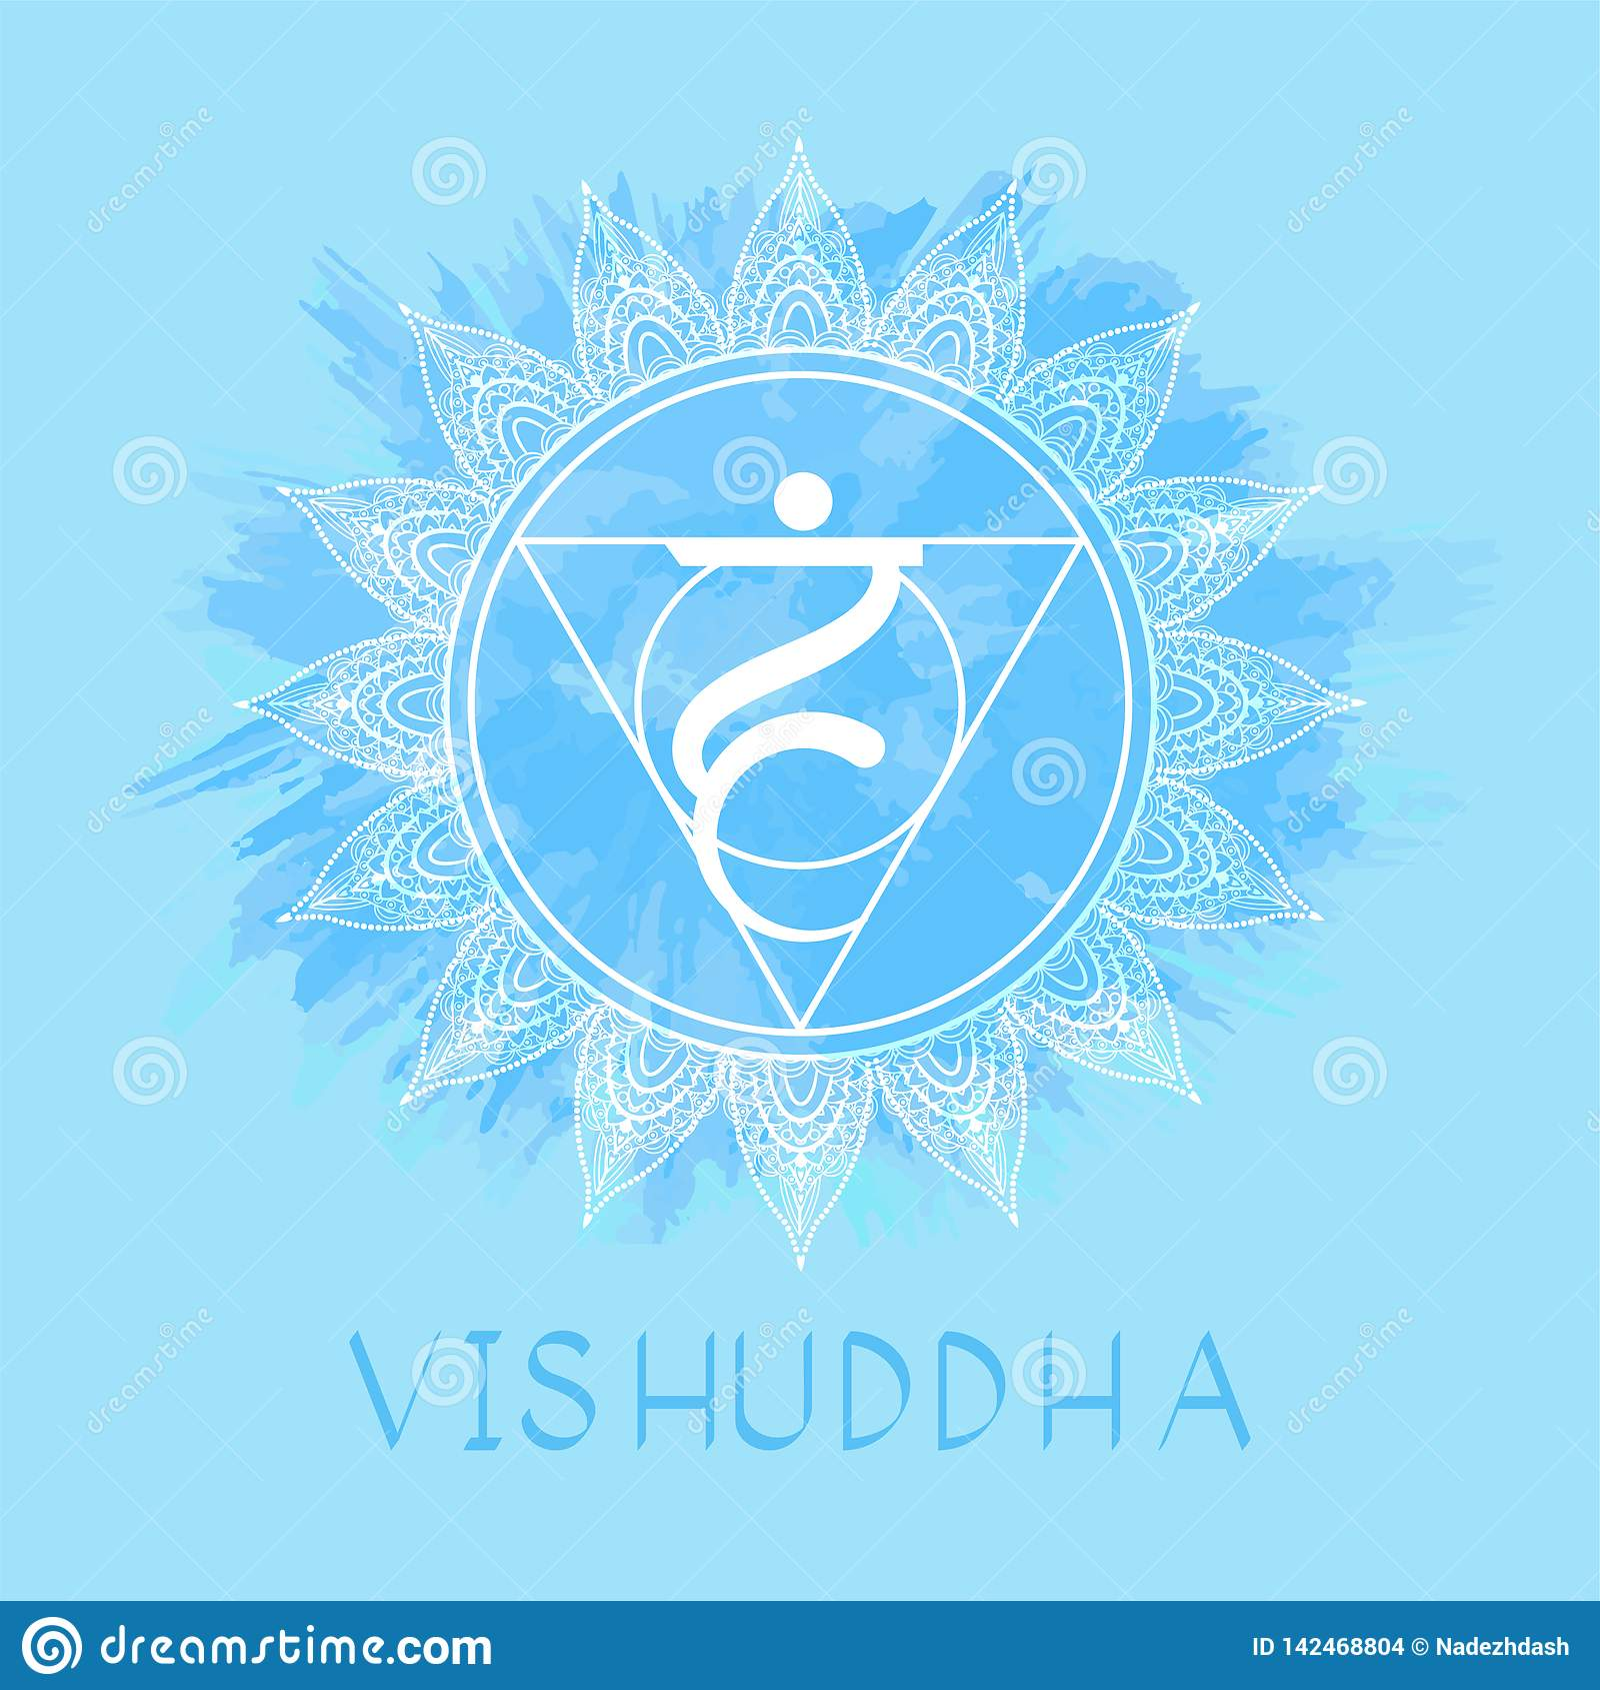 Vectorillustratie met symbool Vishuddha - Keelchakra op waterverfachtergrond